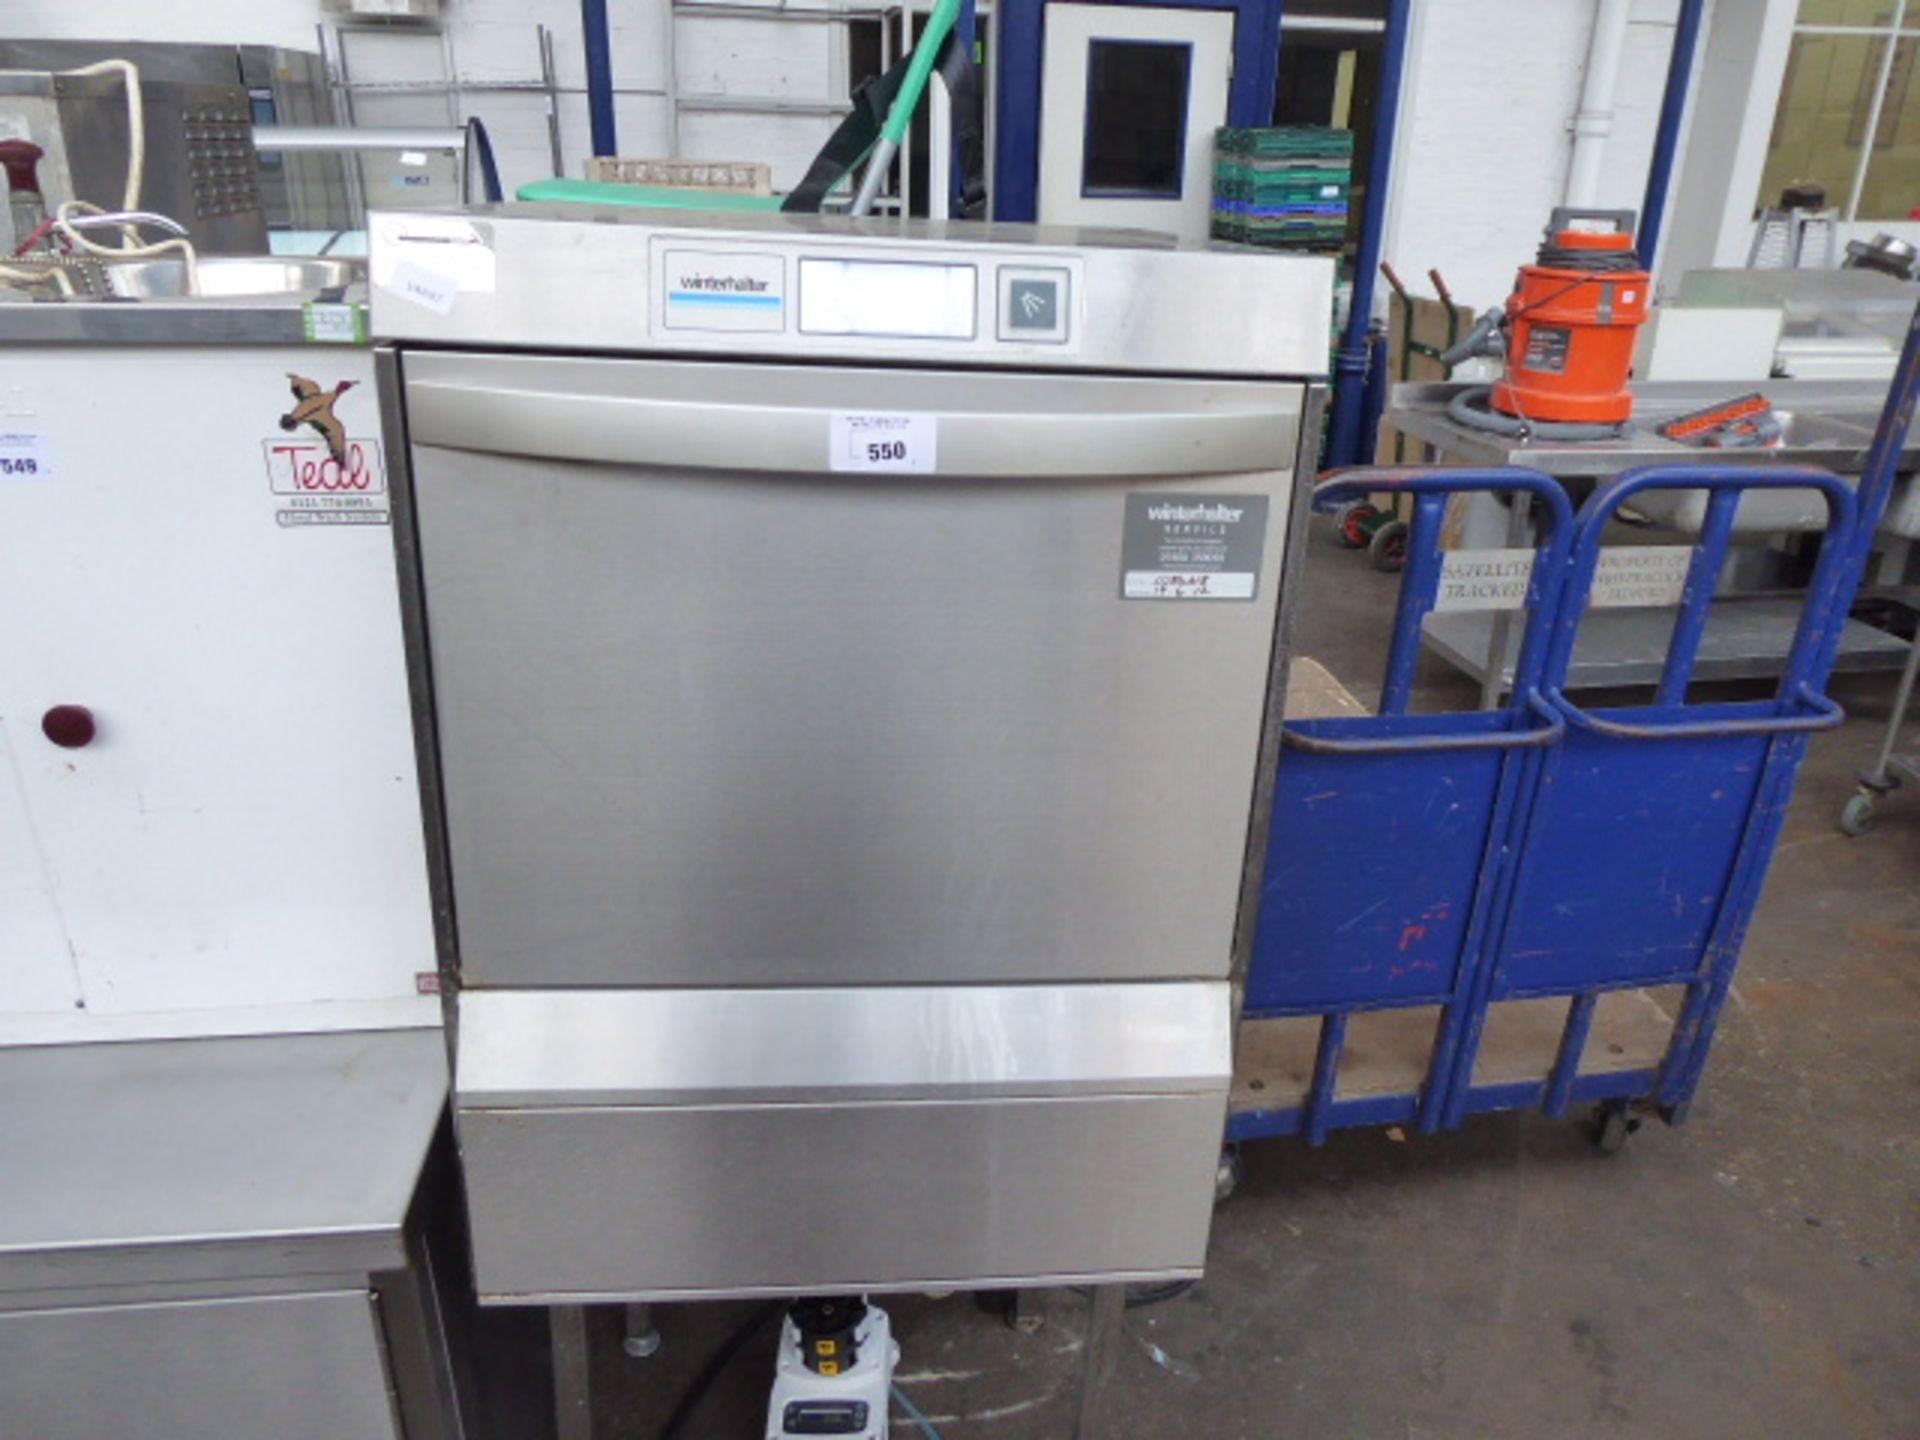 Lot 550 - 60cm Winterhalter drop front dishwasher on stand